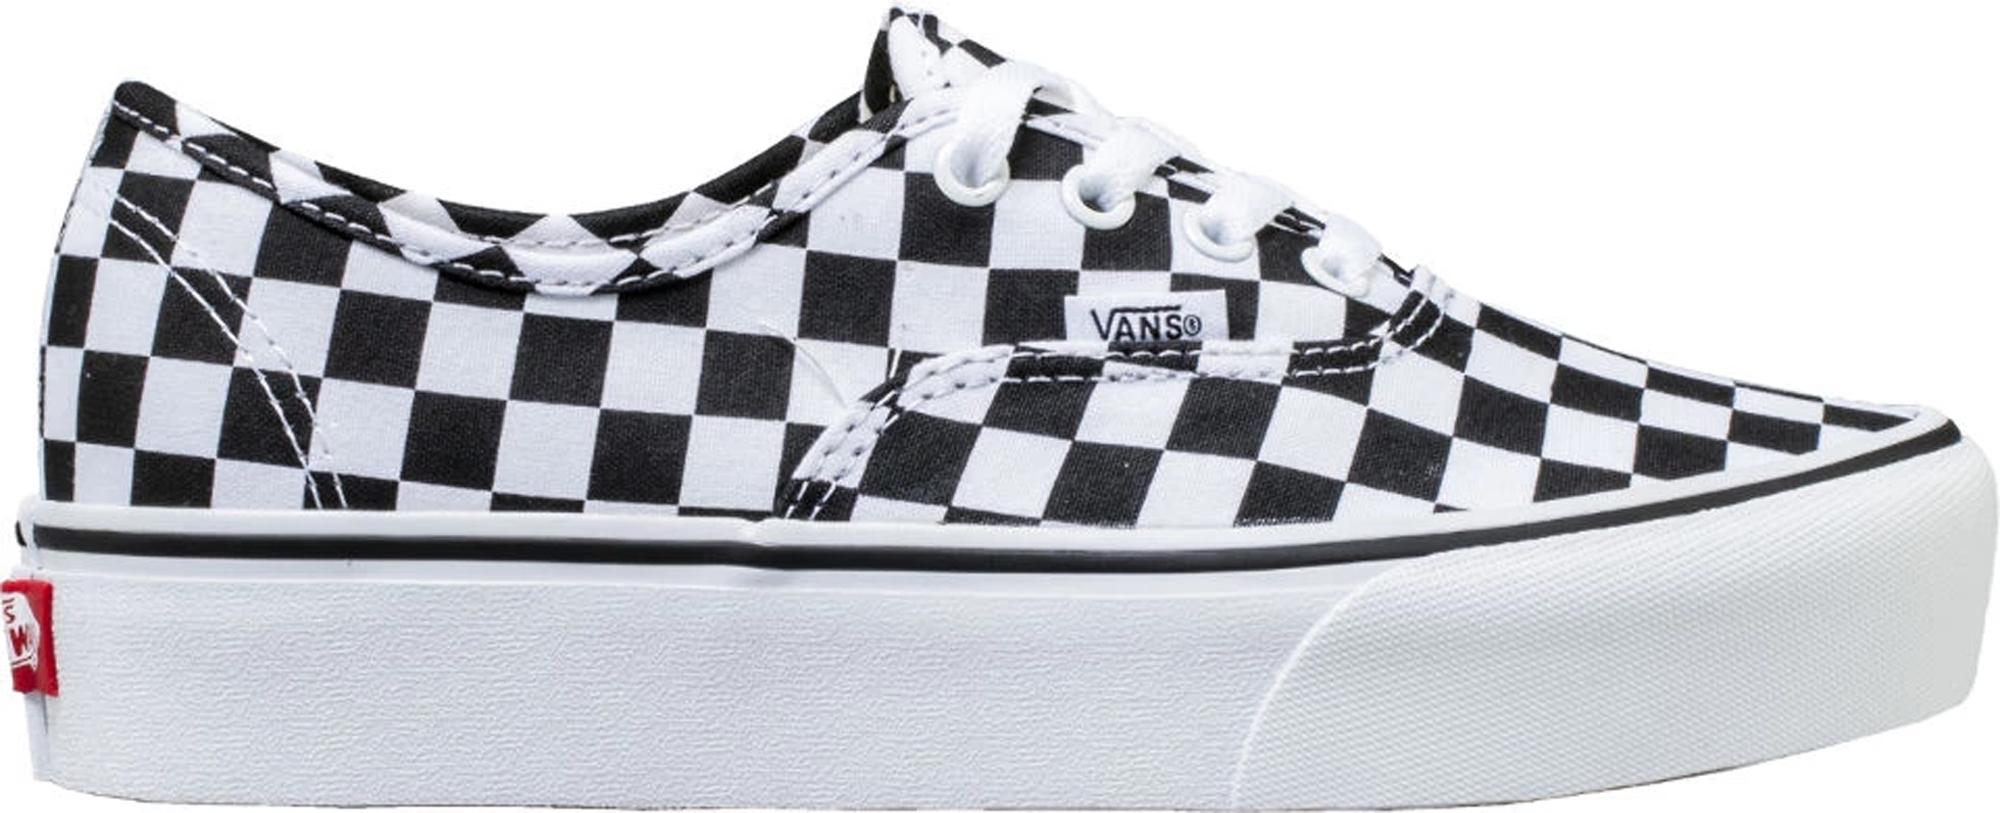 vans authentic checkerboard platform